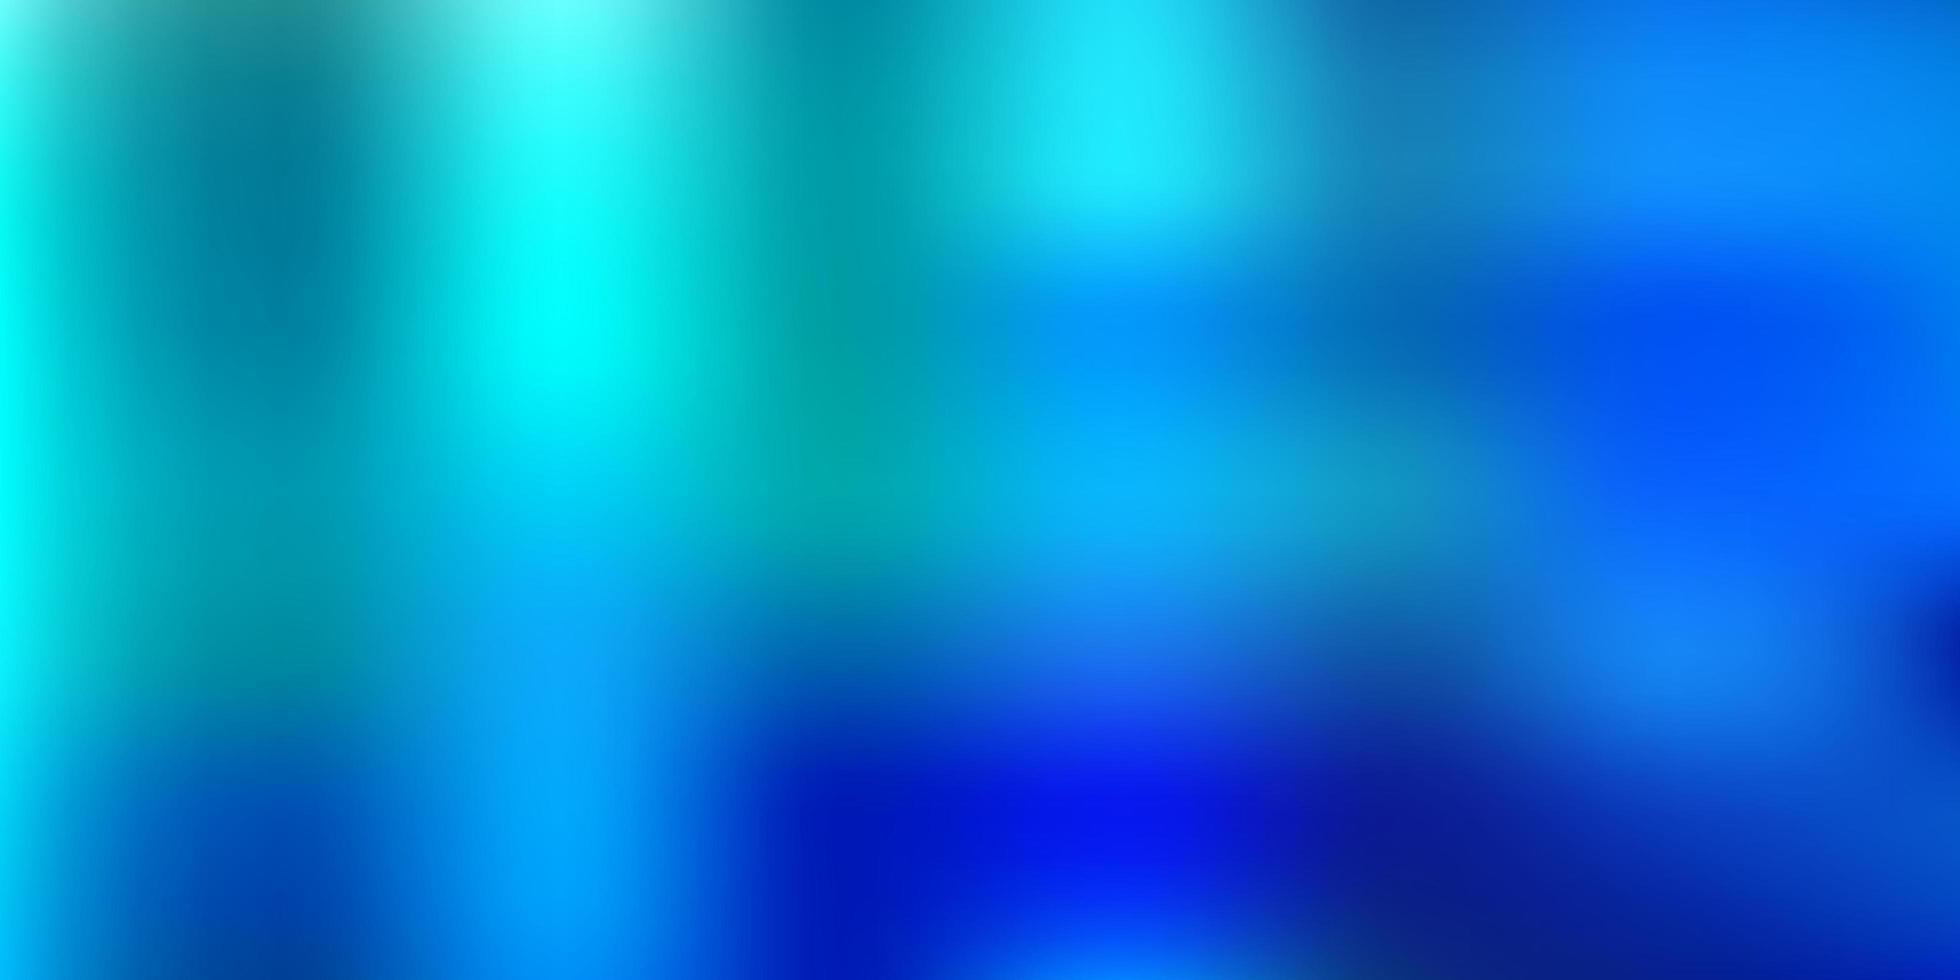 Light blue vector abstract blur backdrop.